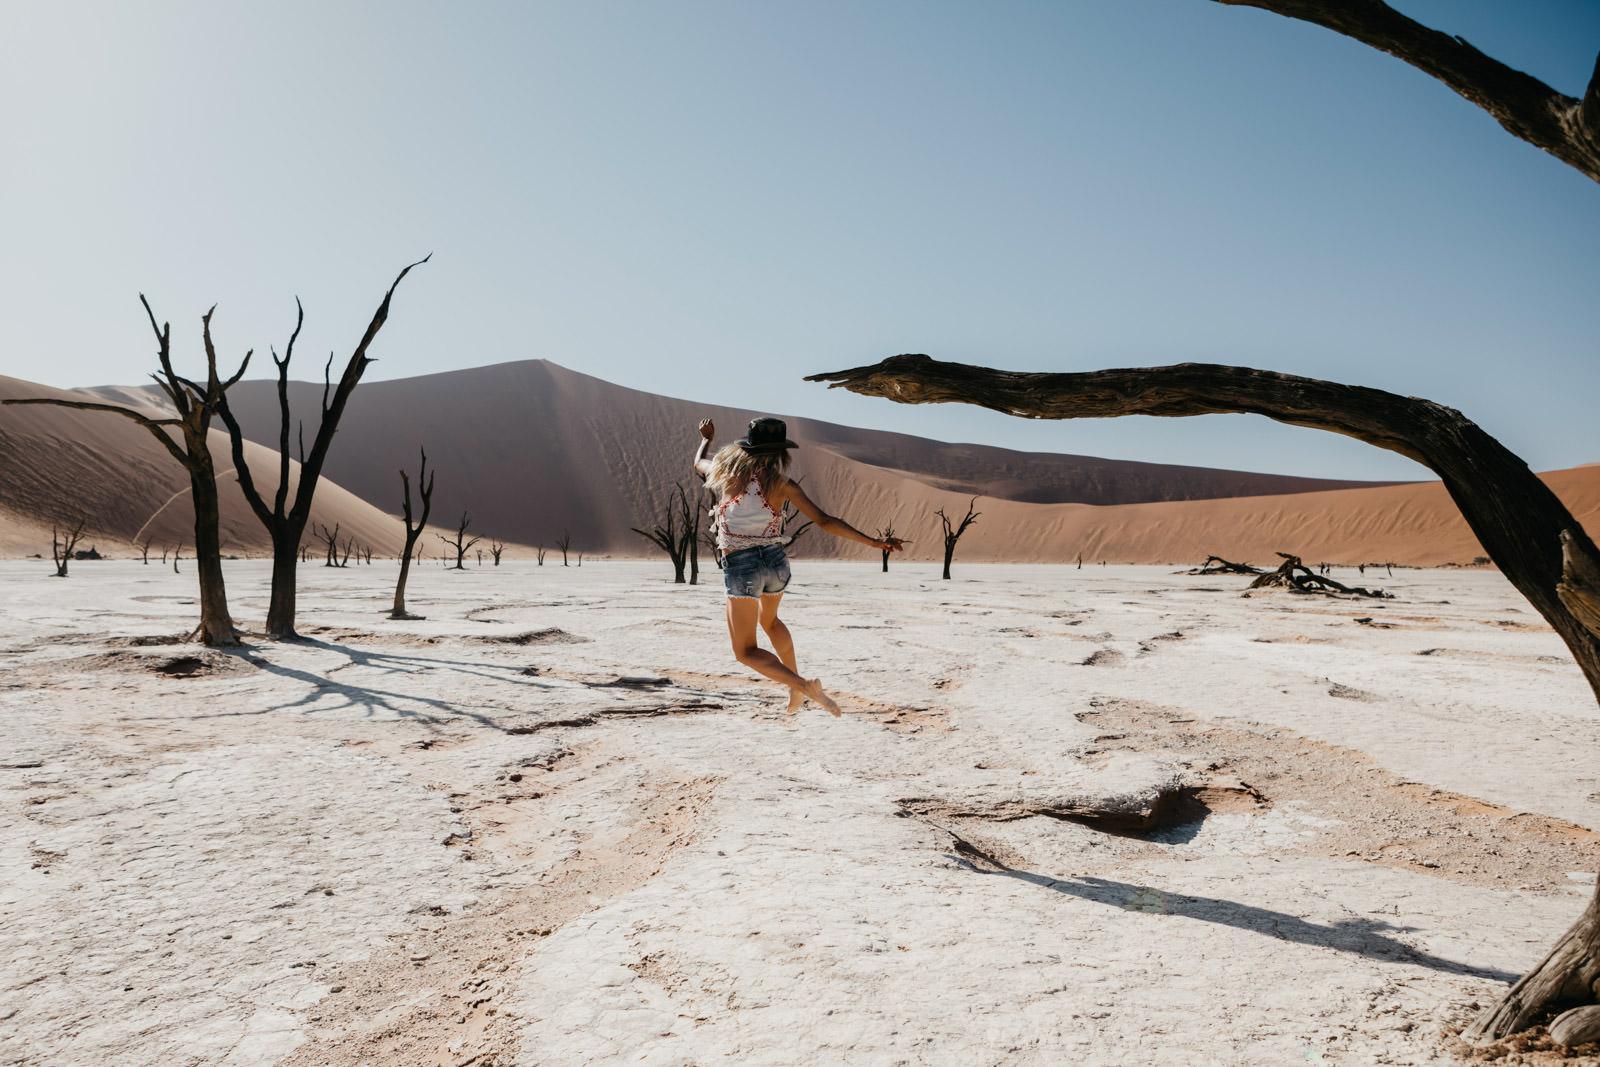 namibia_trip_rooftent_camping_roadtrip (18 von 26).jpg